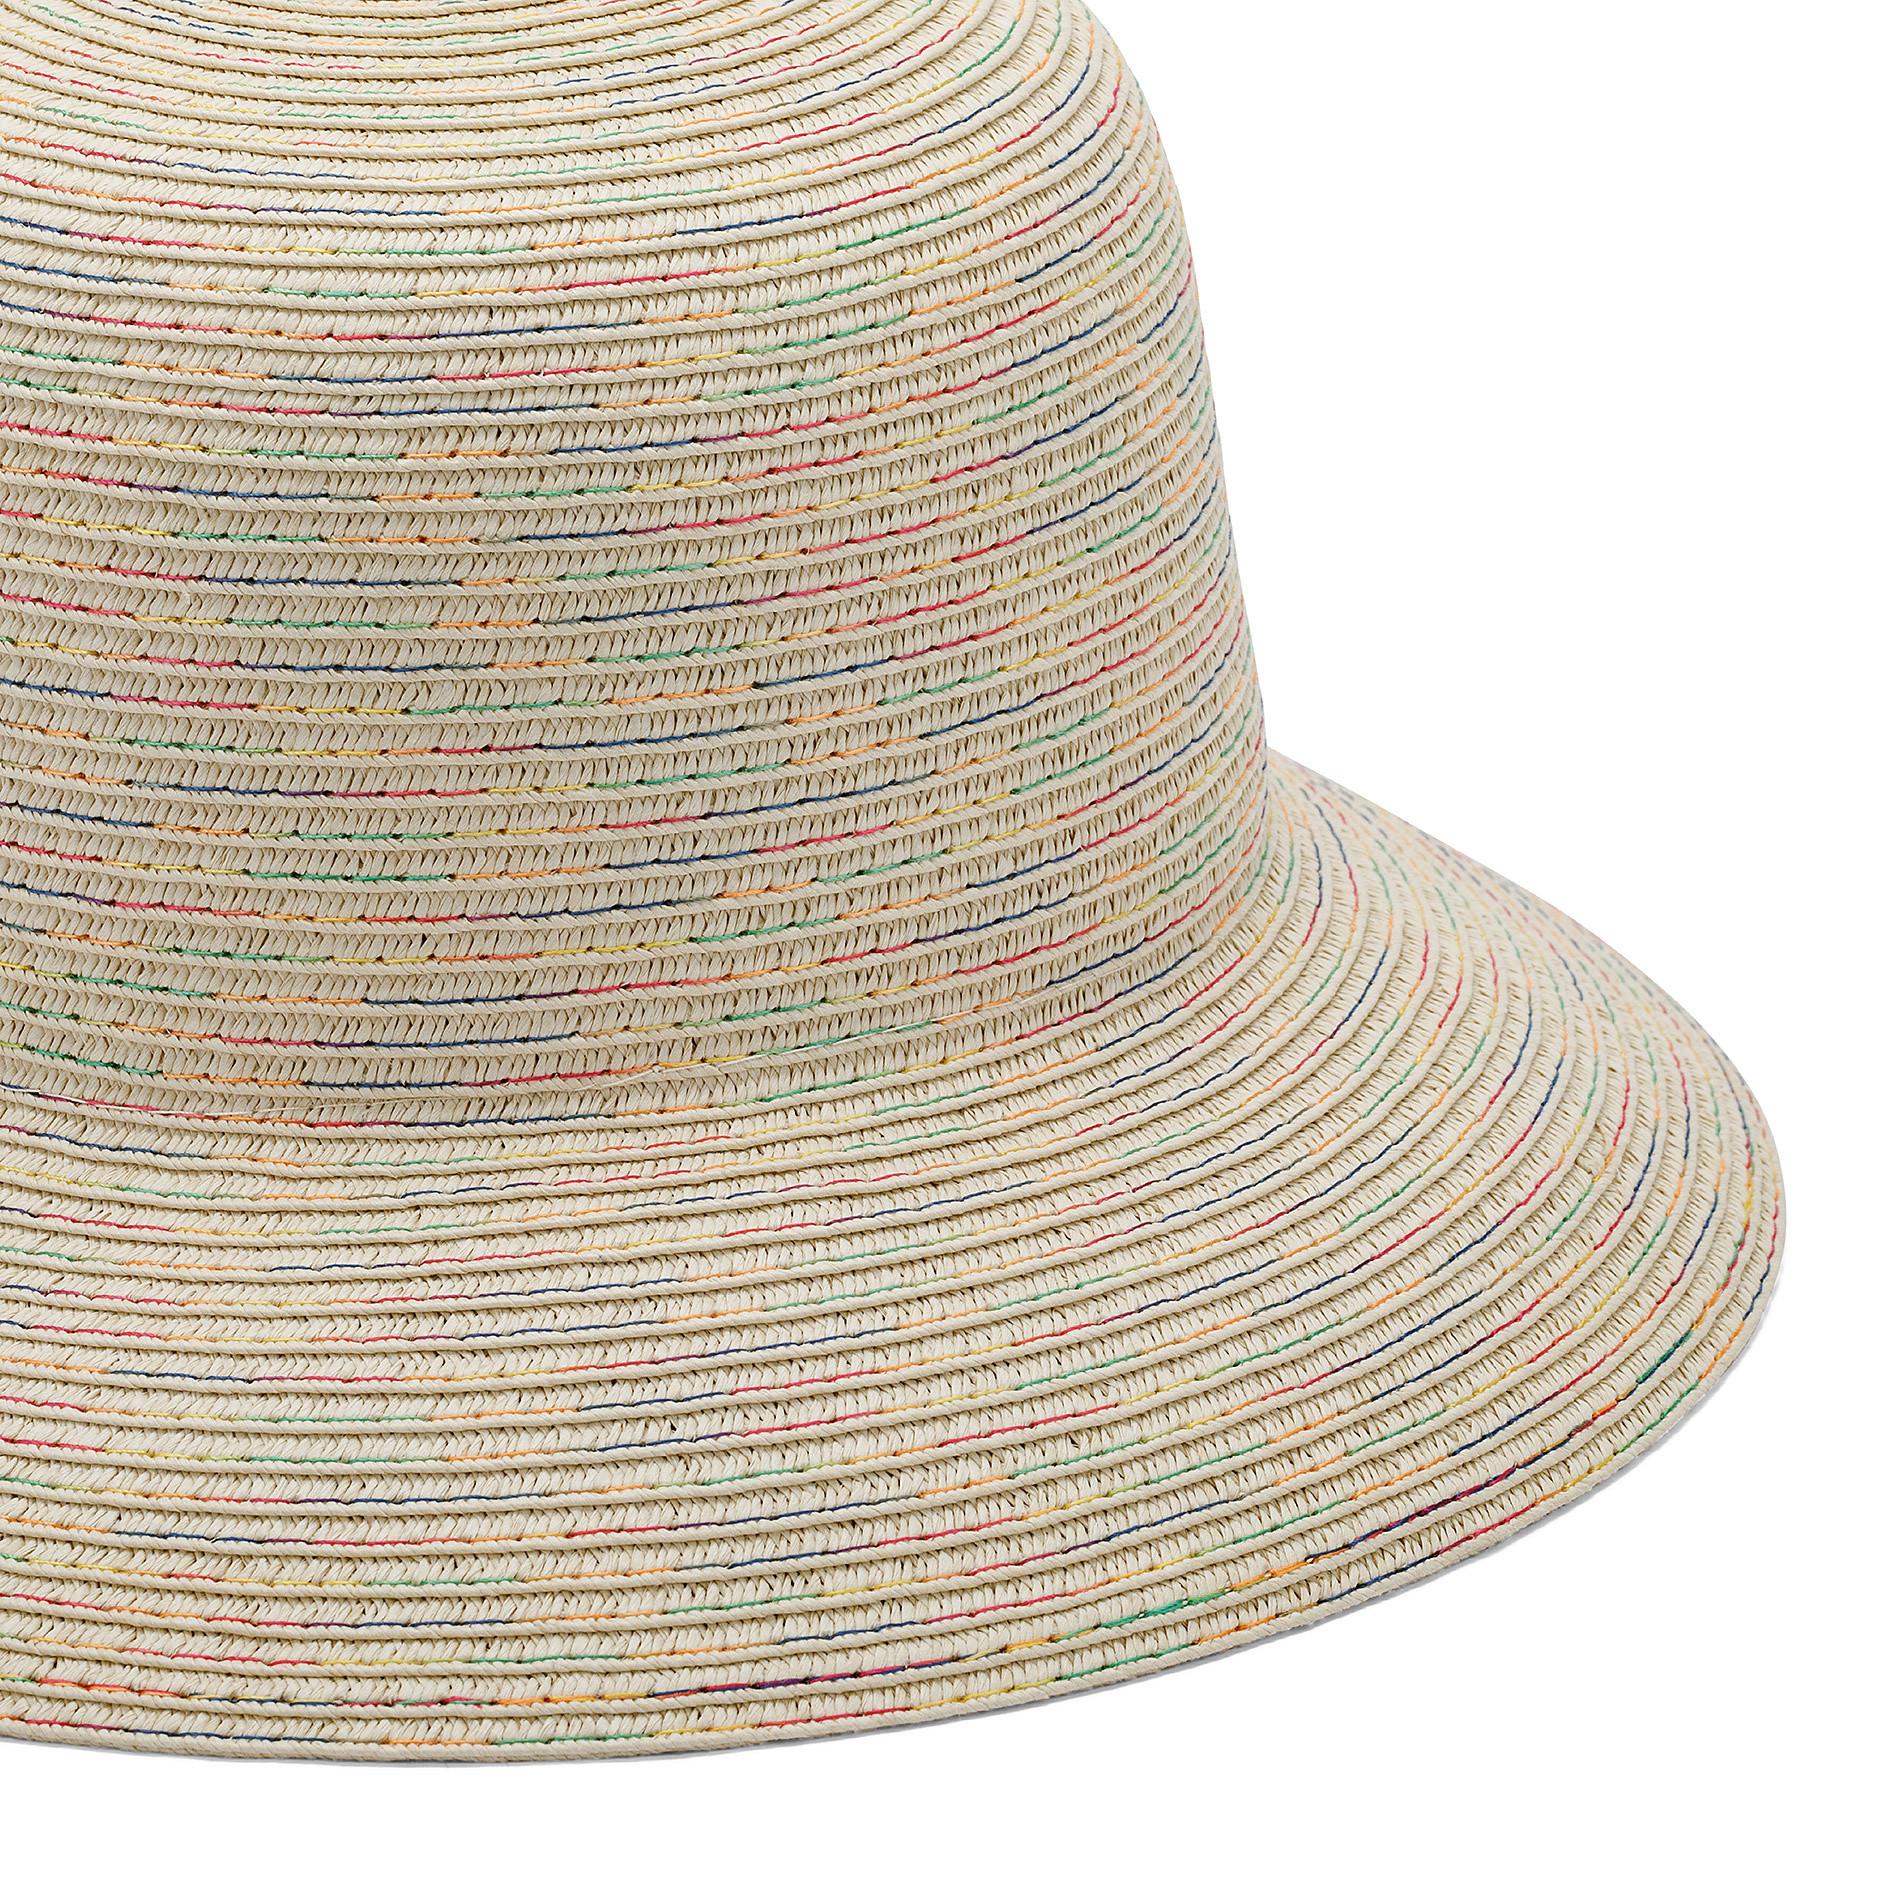 Cappello multicolore Koan, Beige chiaro, large image number 1